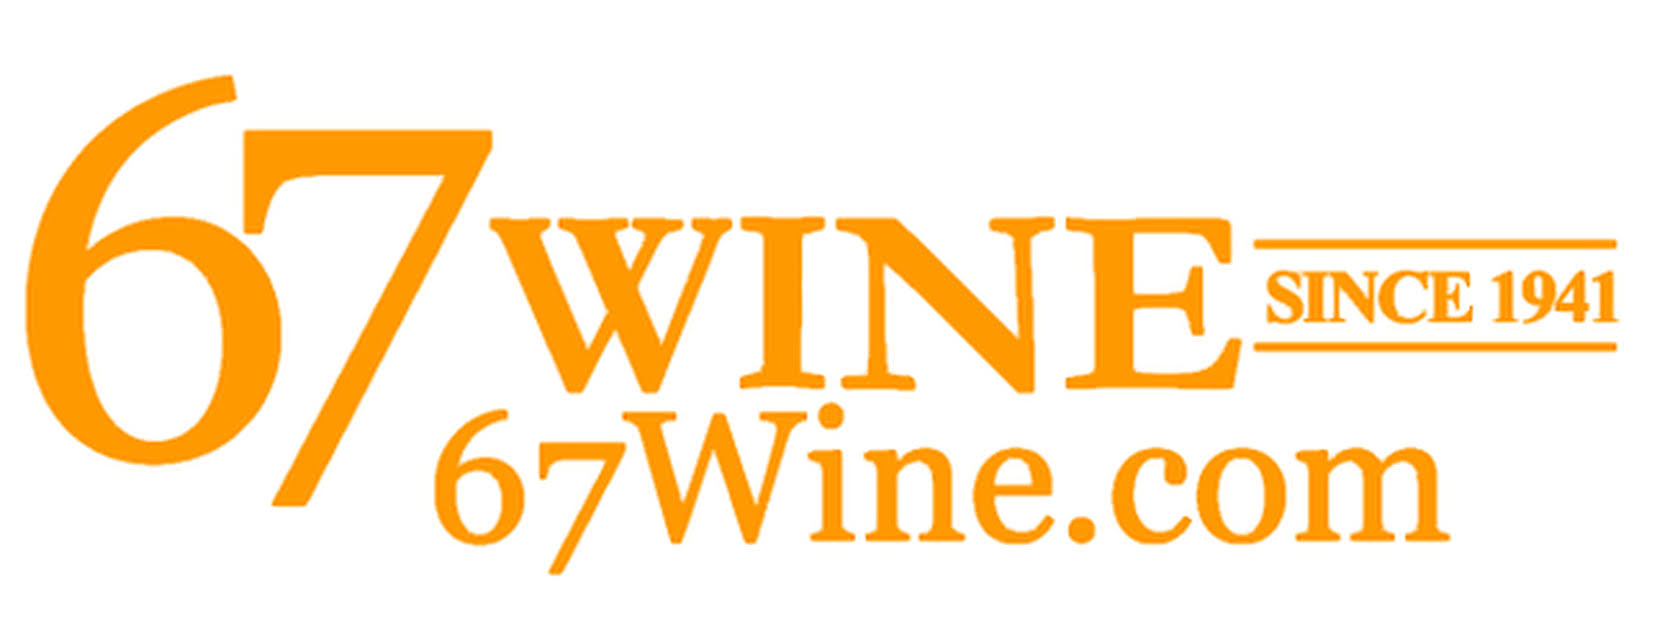 67 Wine & Spirits logo